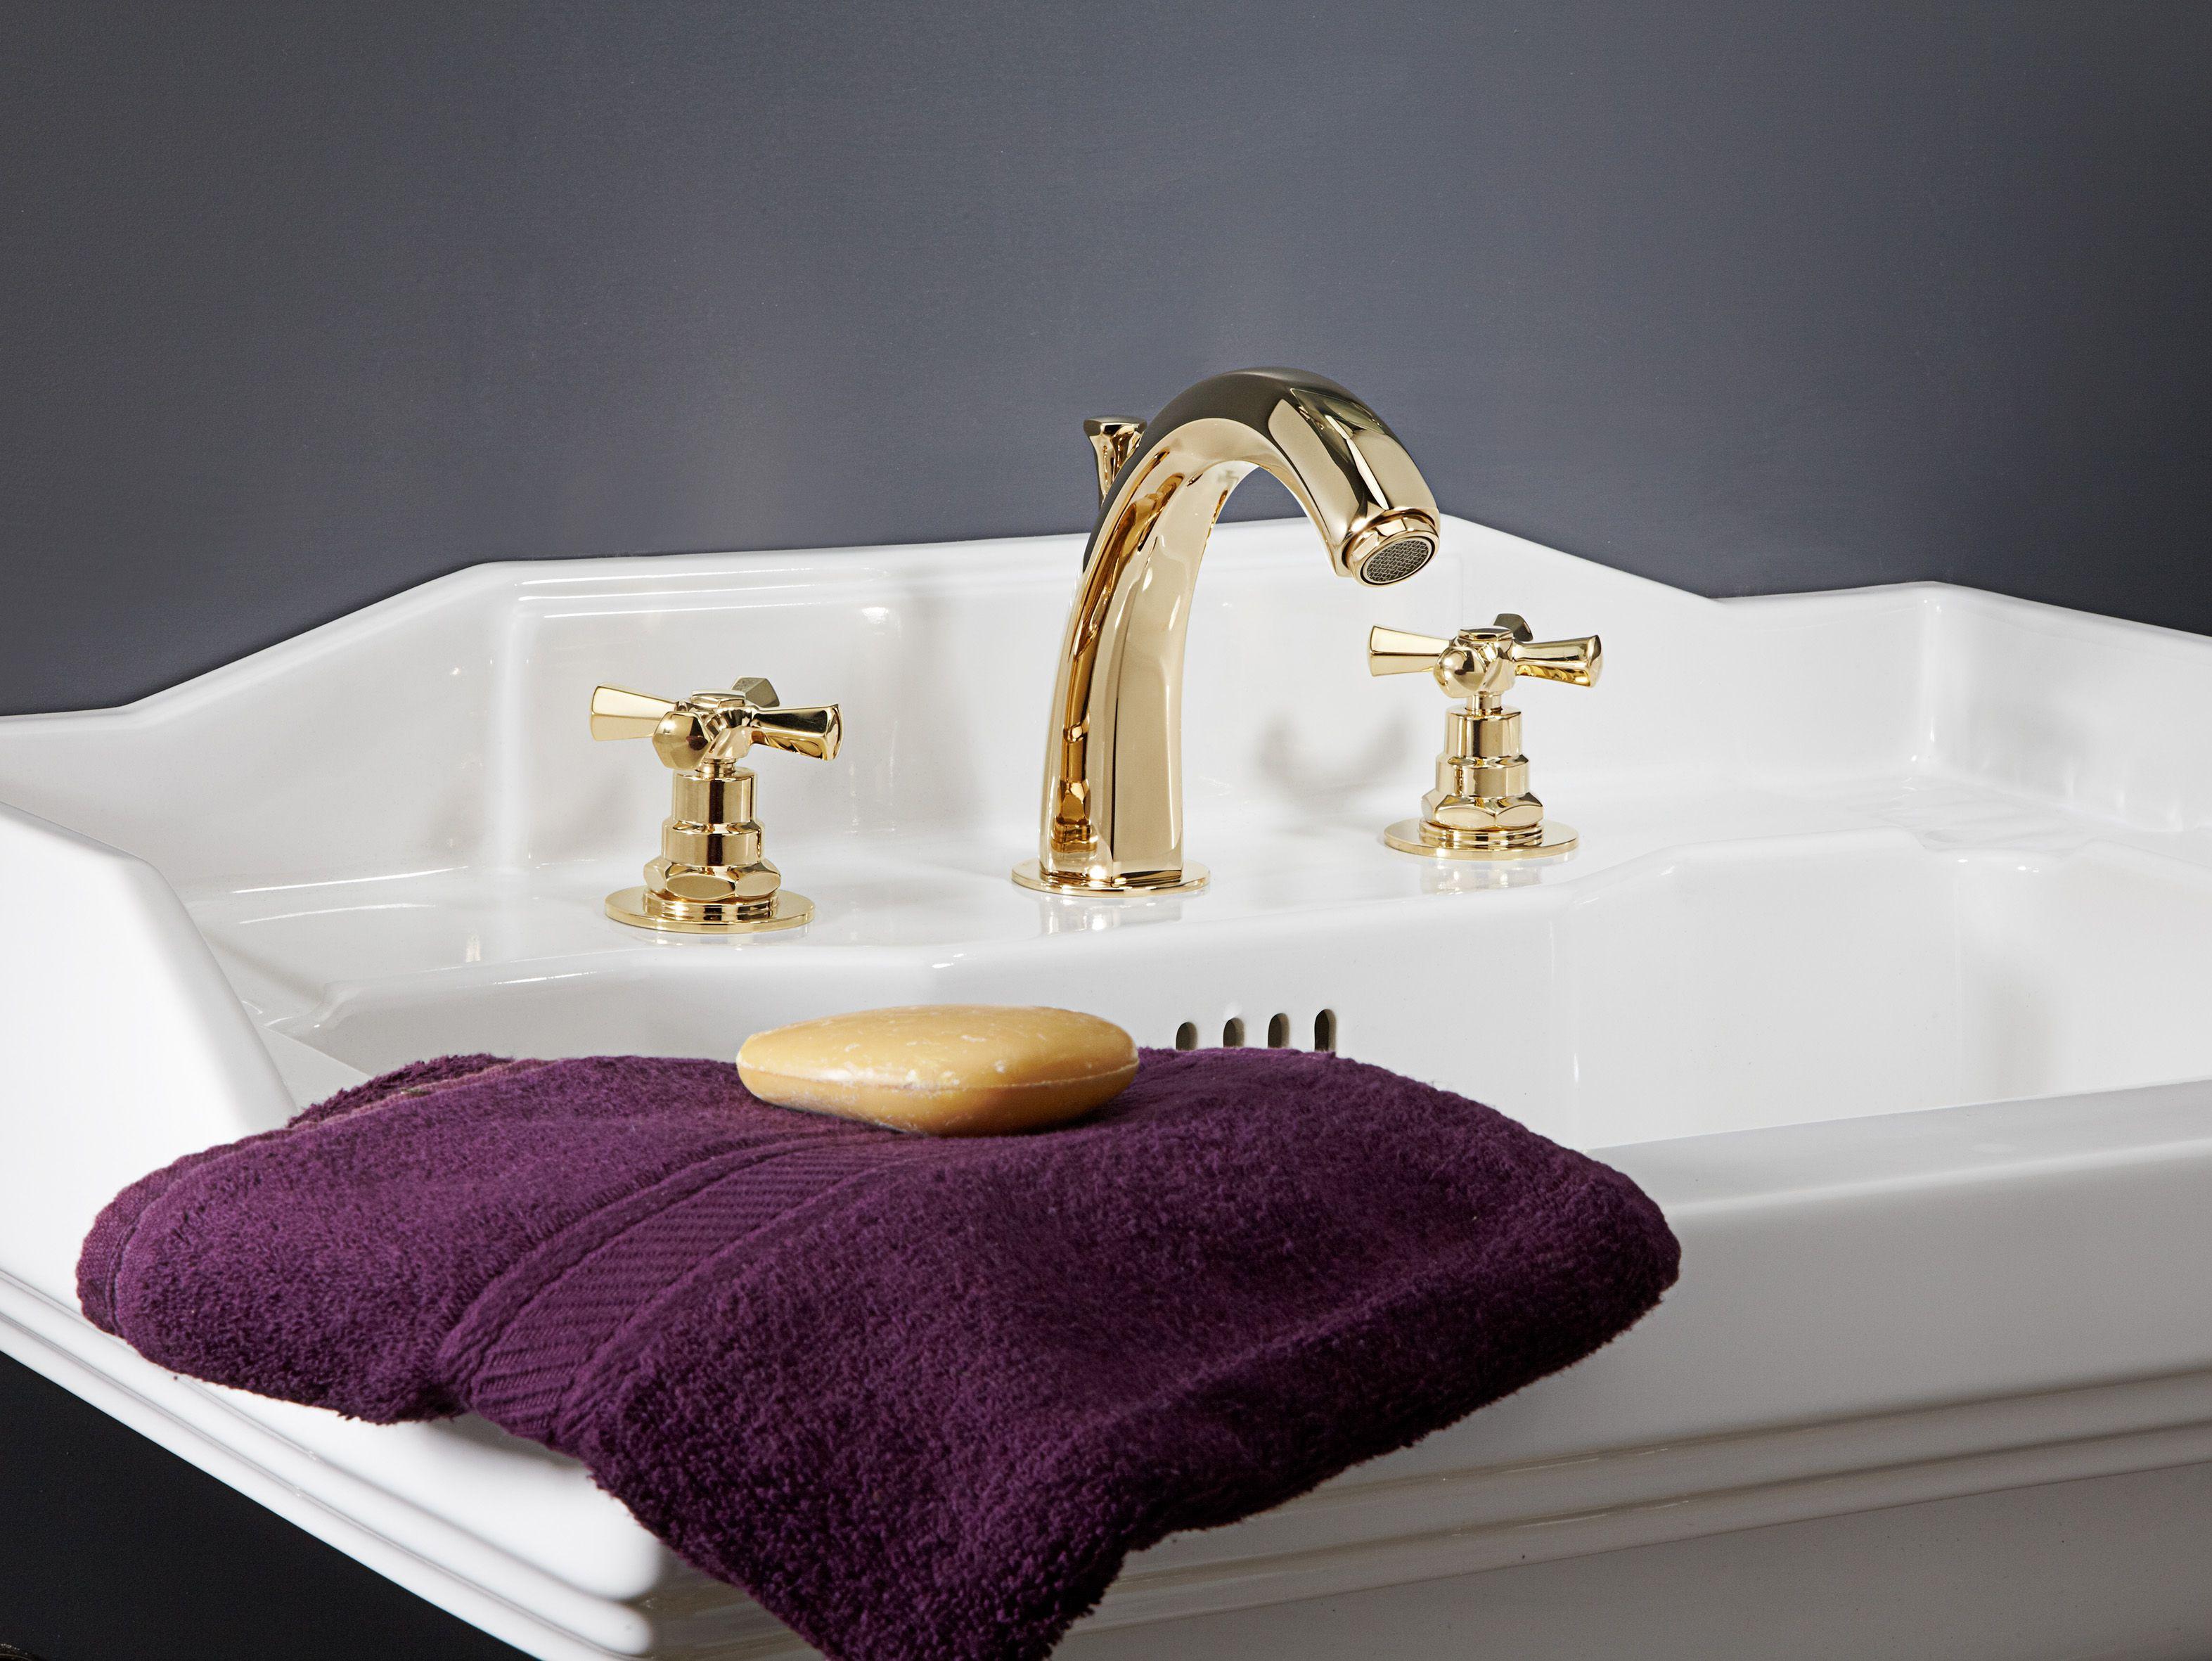 Palace Bad Design Waschtischarmatur Armaturen